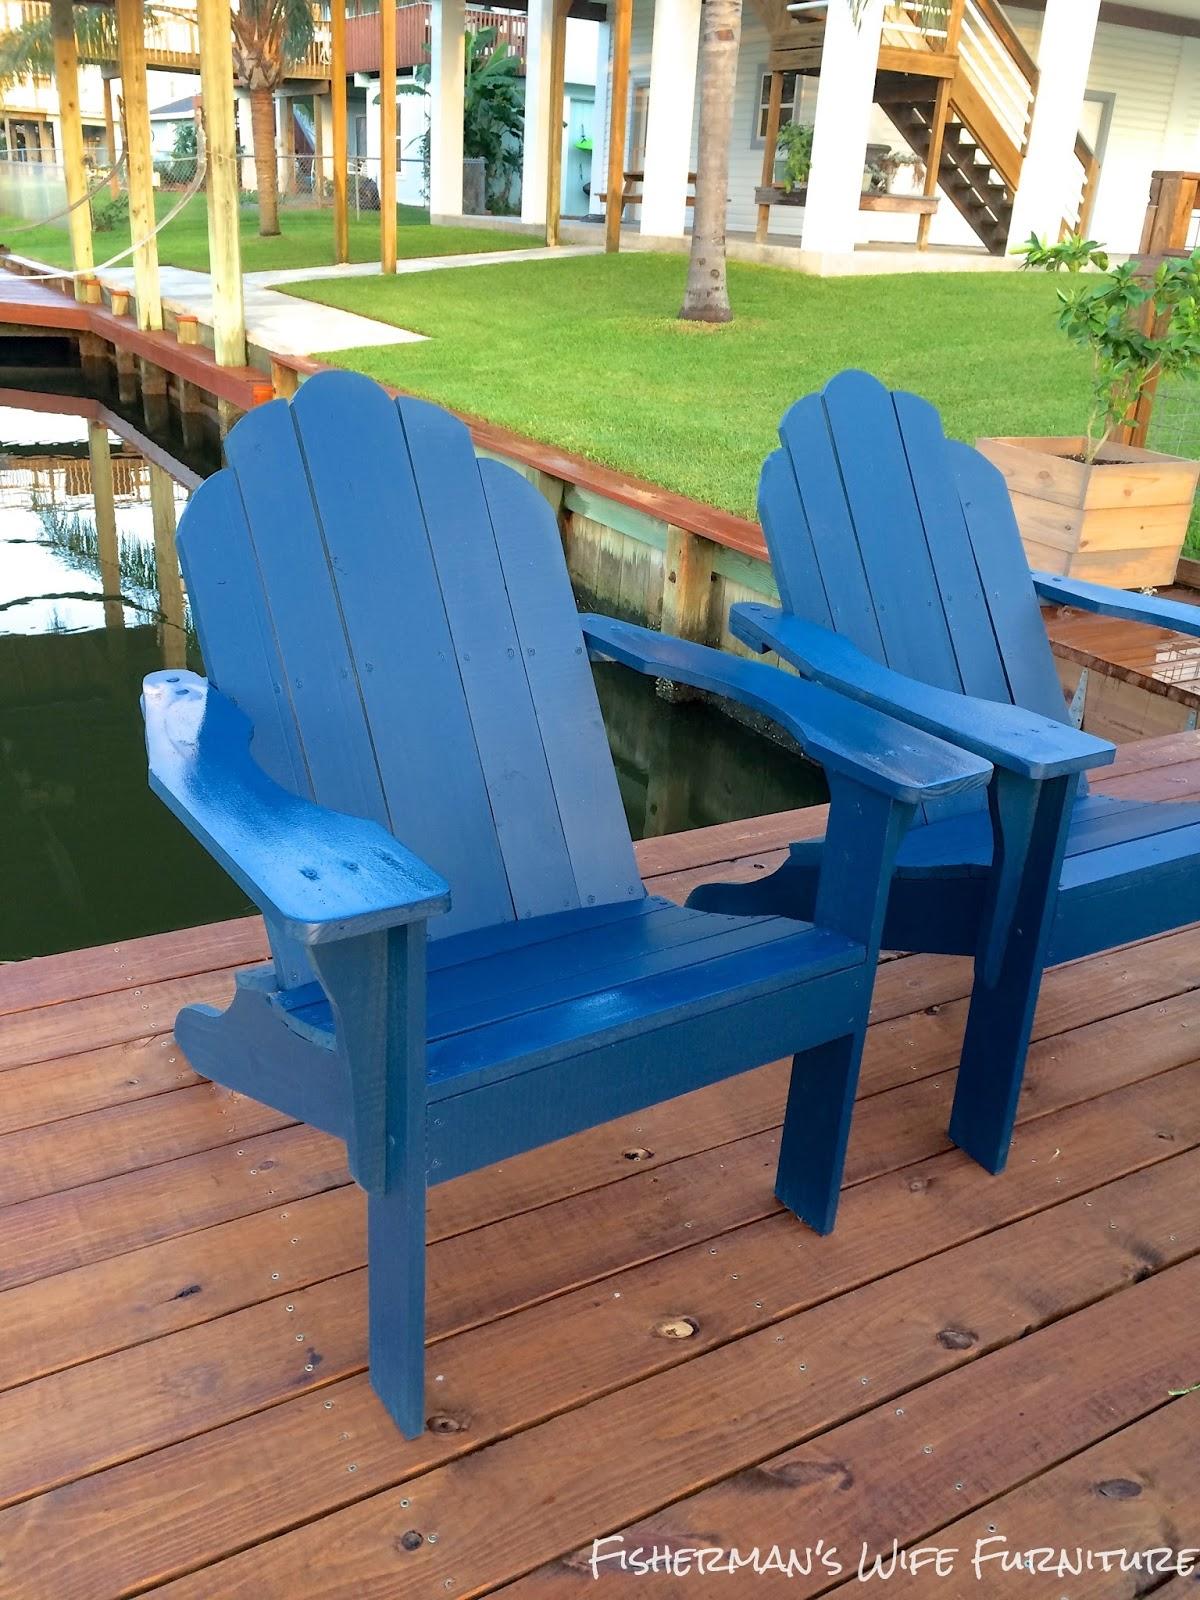 Diy Adirondack Chair Kit Posture Fisherman 39s Wife Furniture Chairs